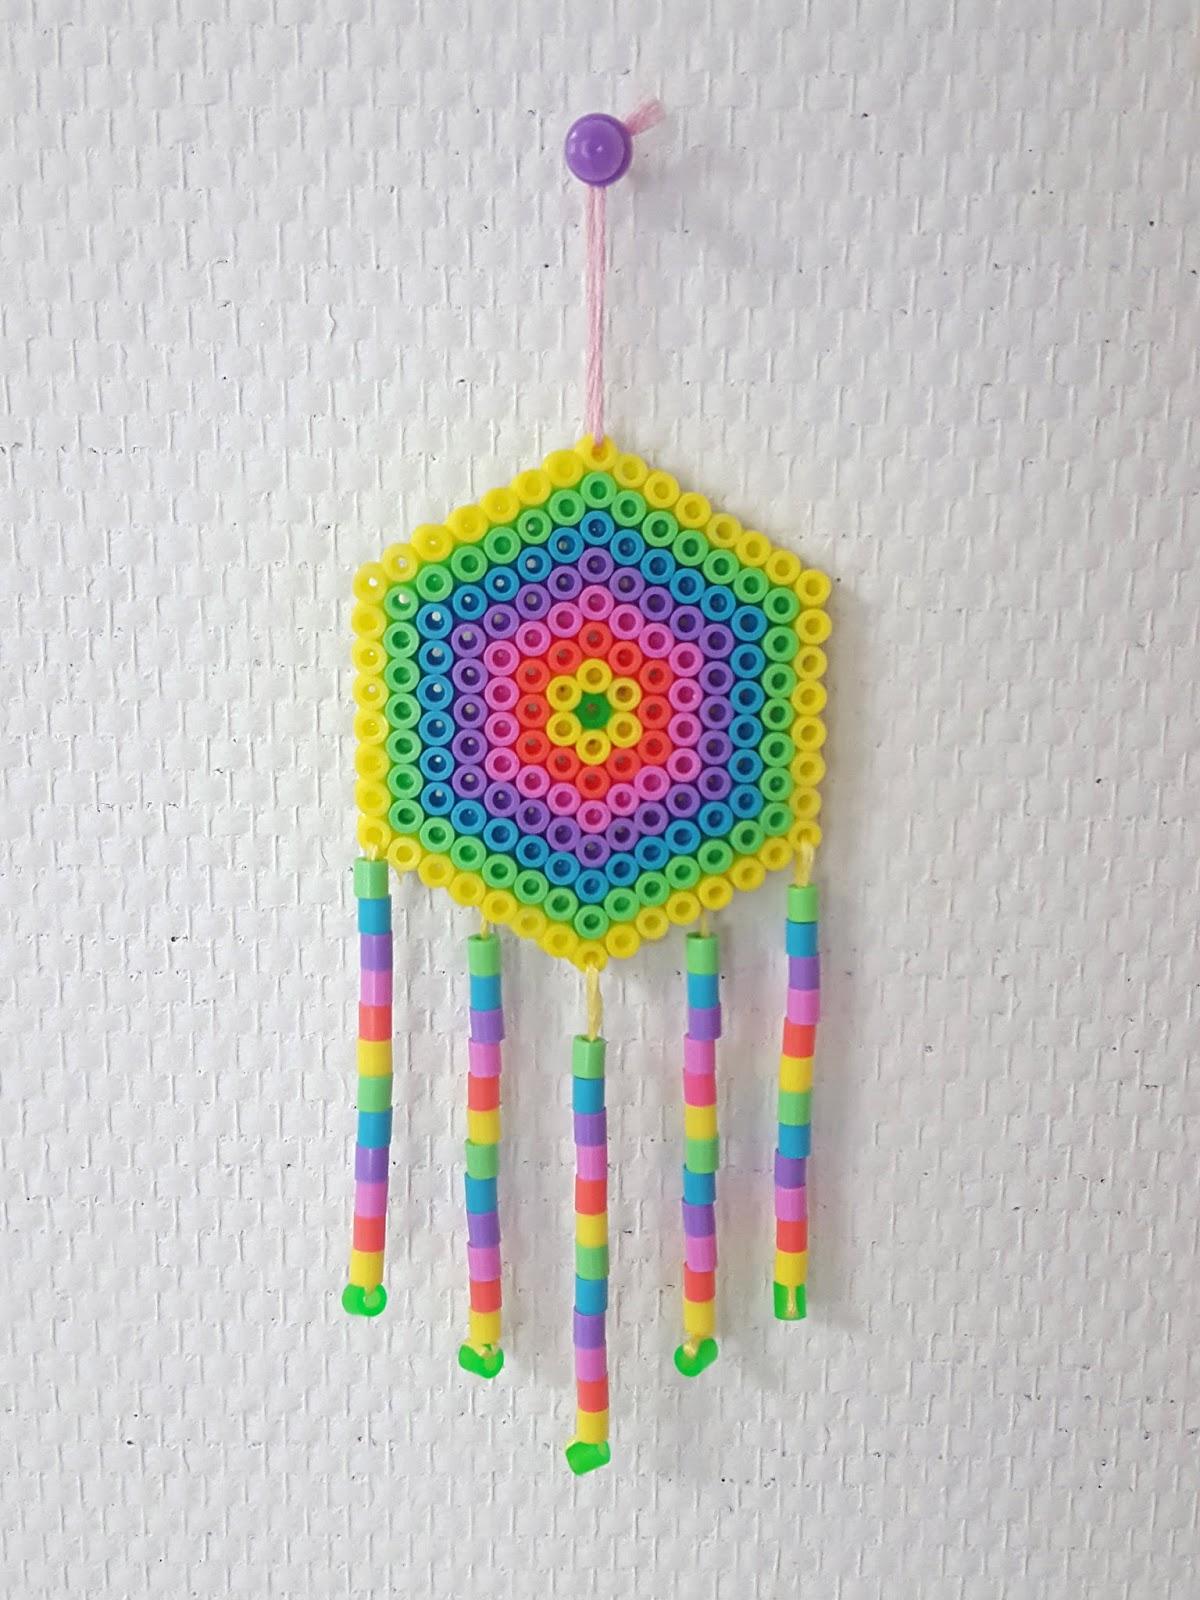 Sehr Trucs de Maëliane, le blog.: [DIY] Attrape rêves facile en perles  PV39